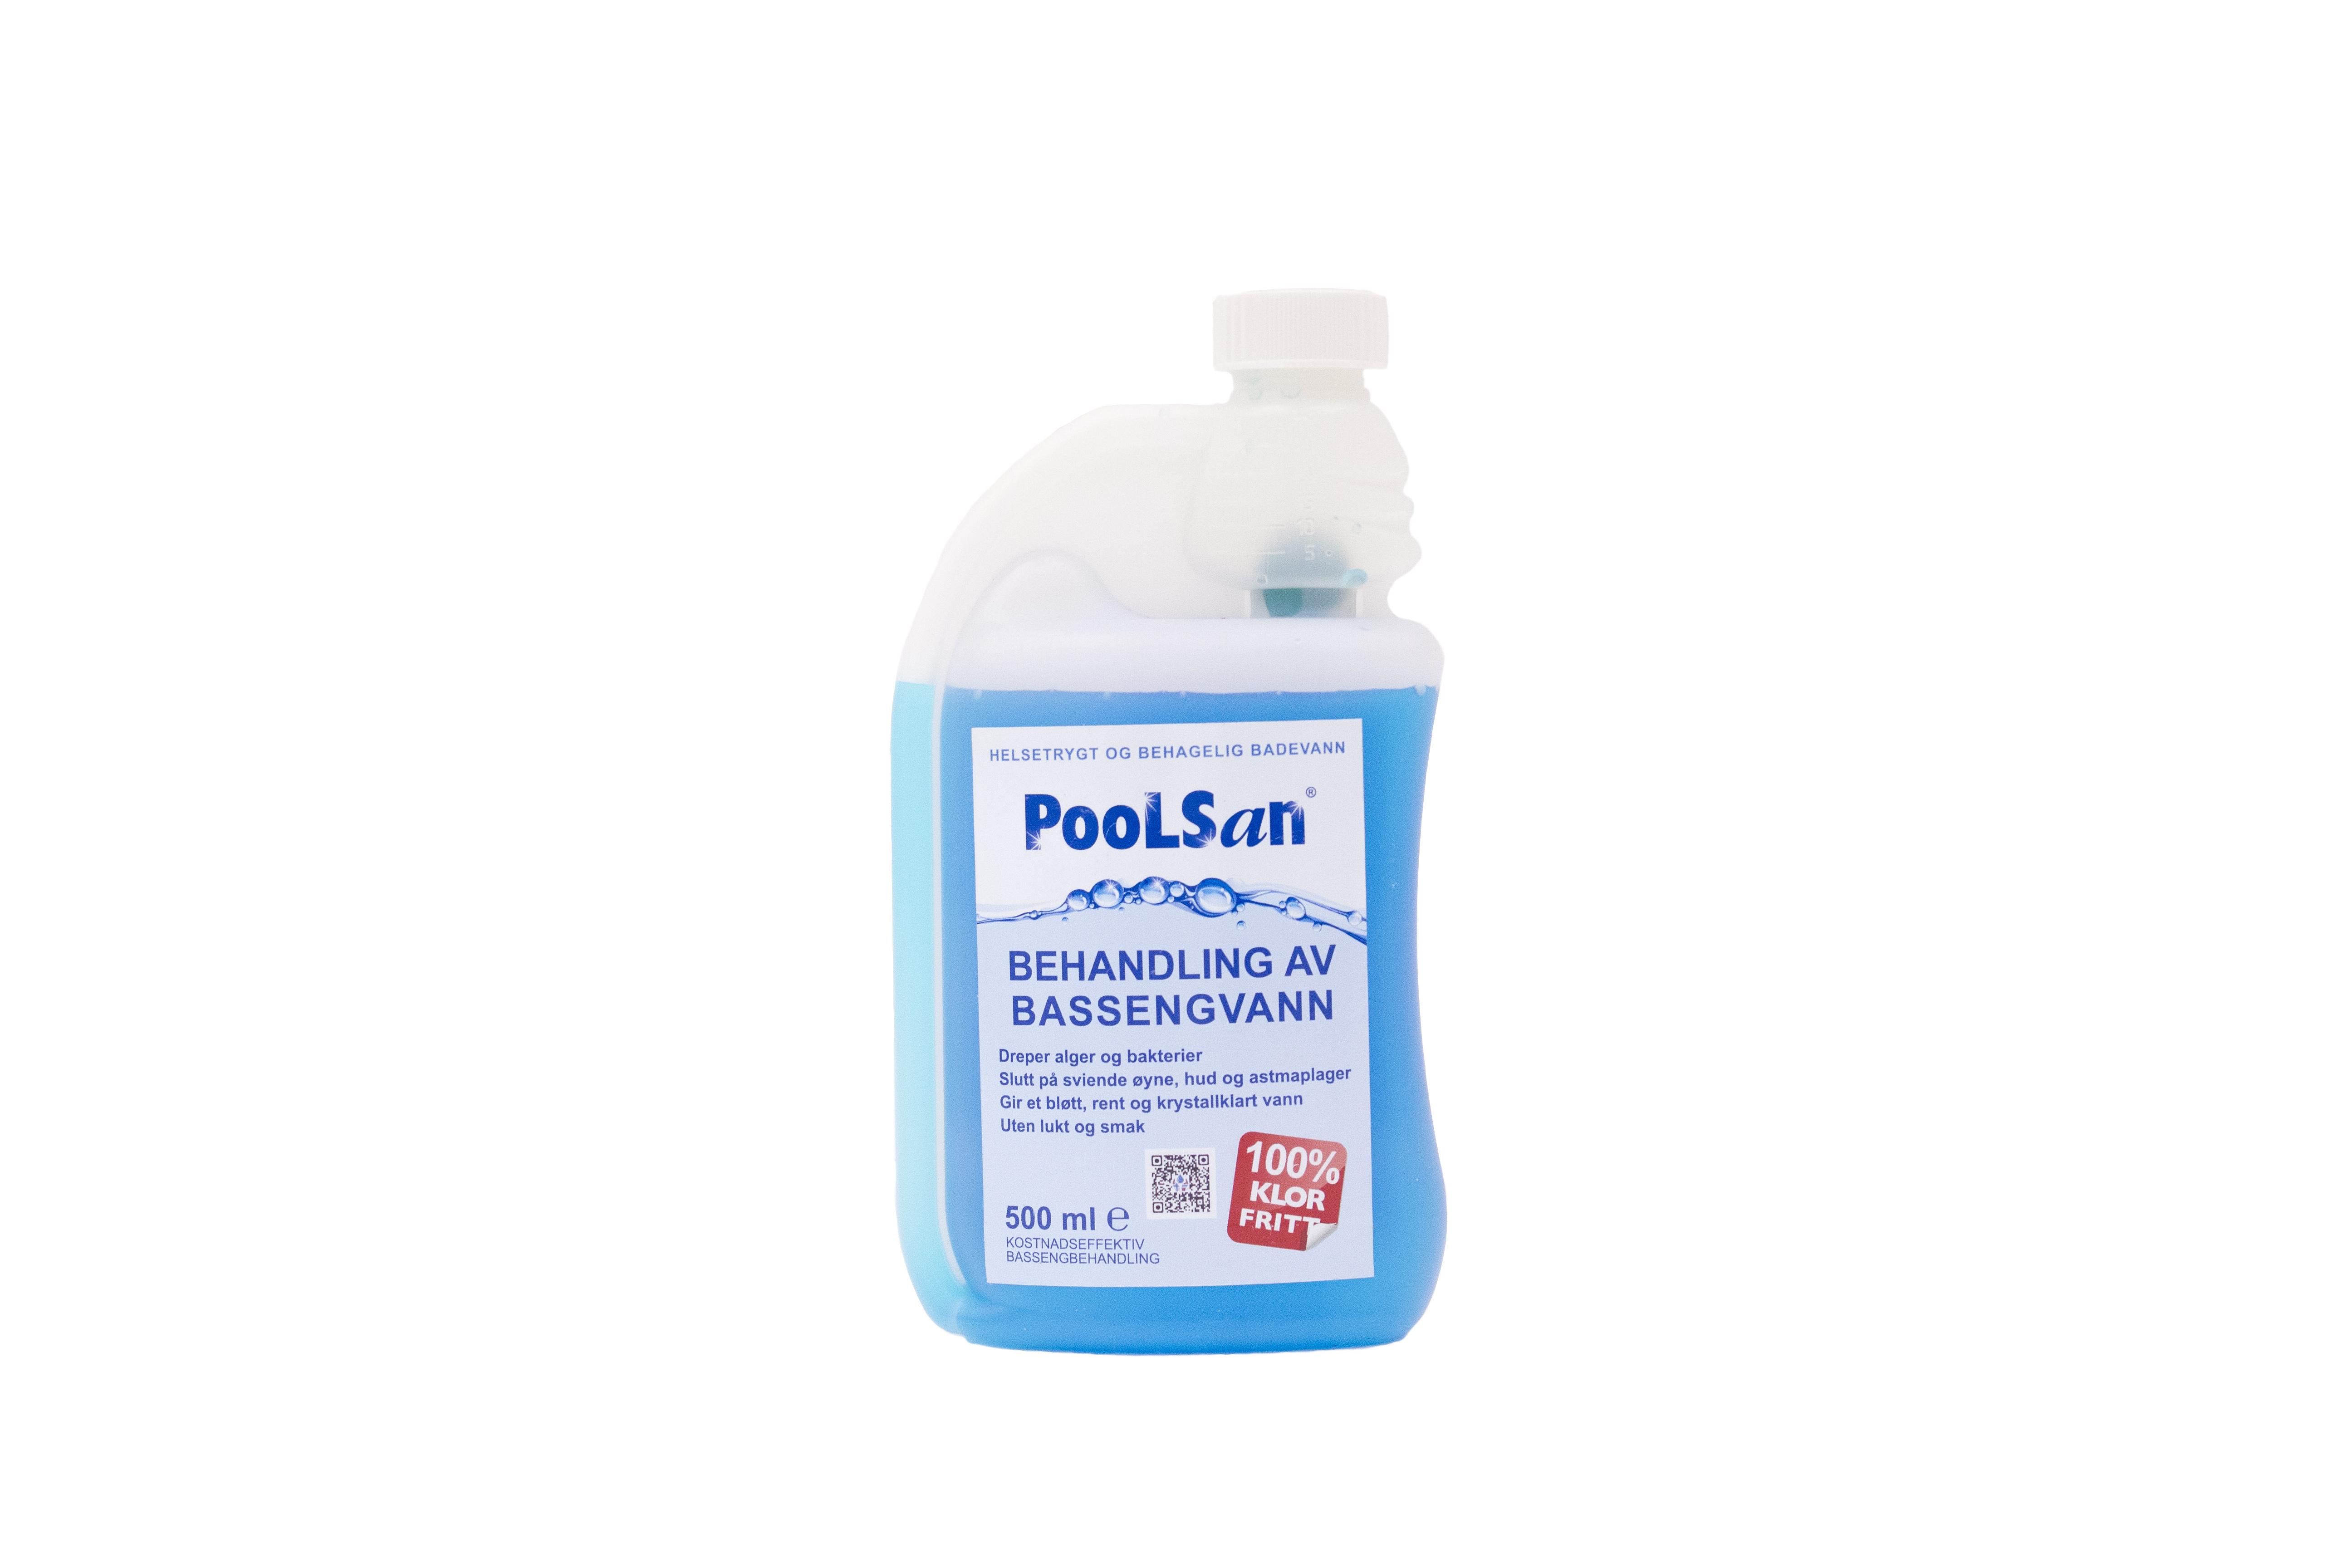 Poolsan refill